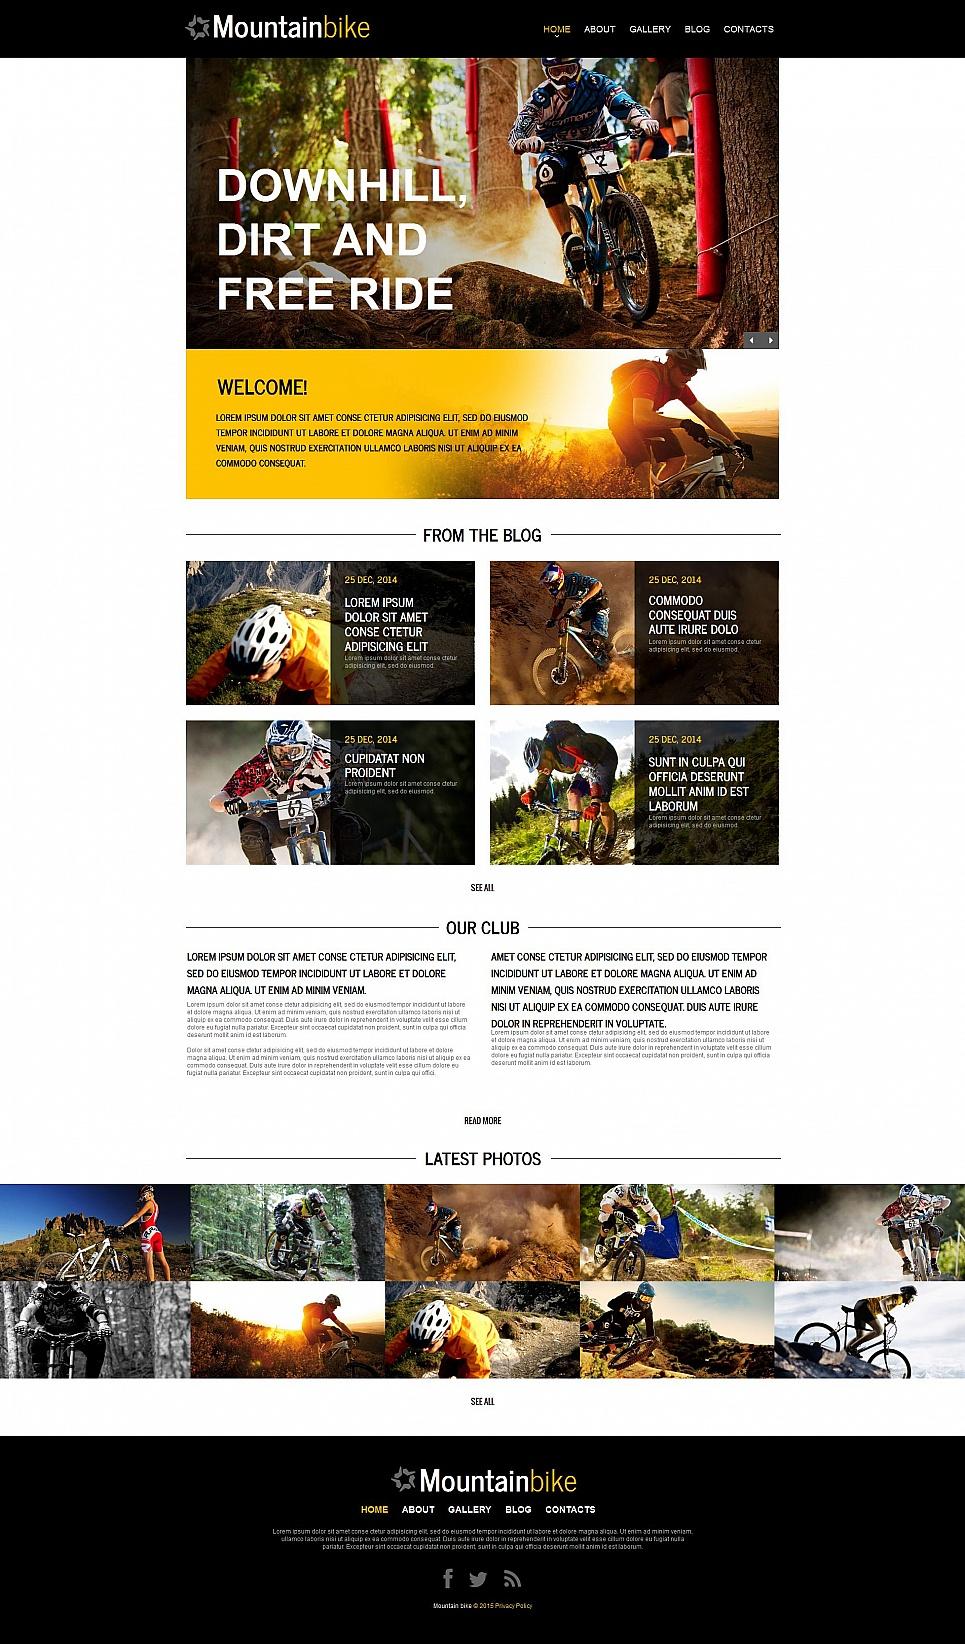 Mountain Bike Website Design - image